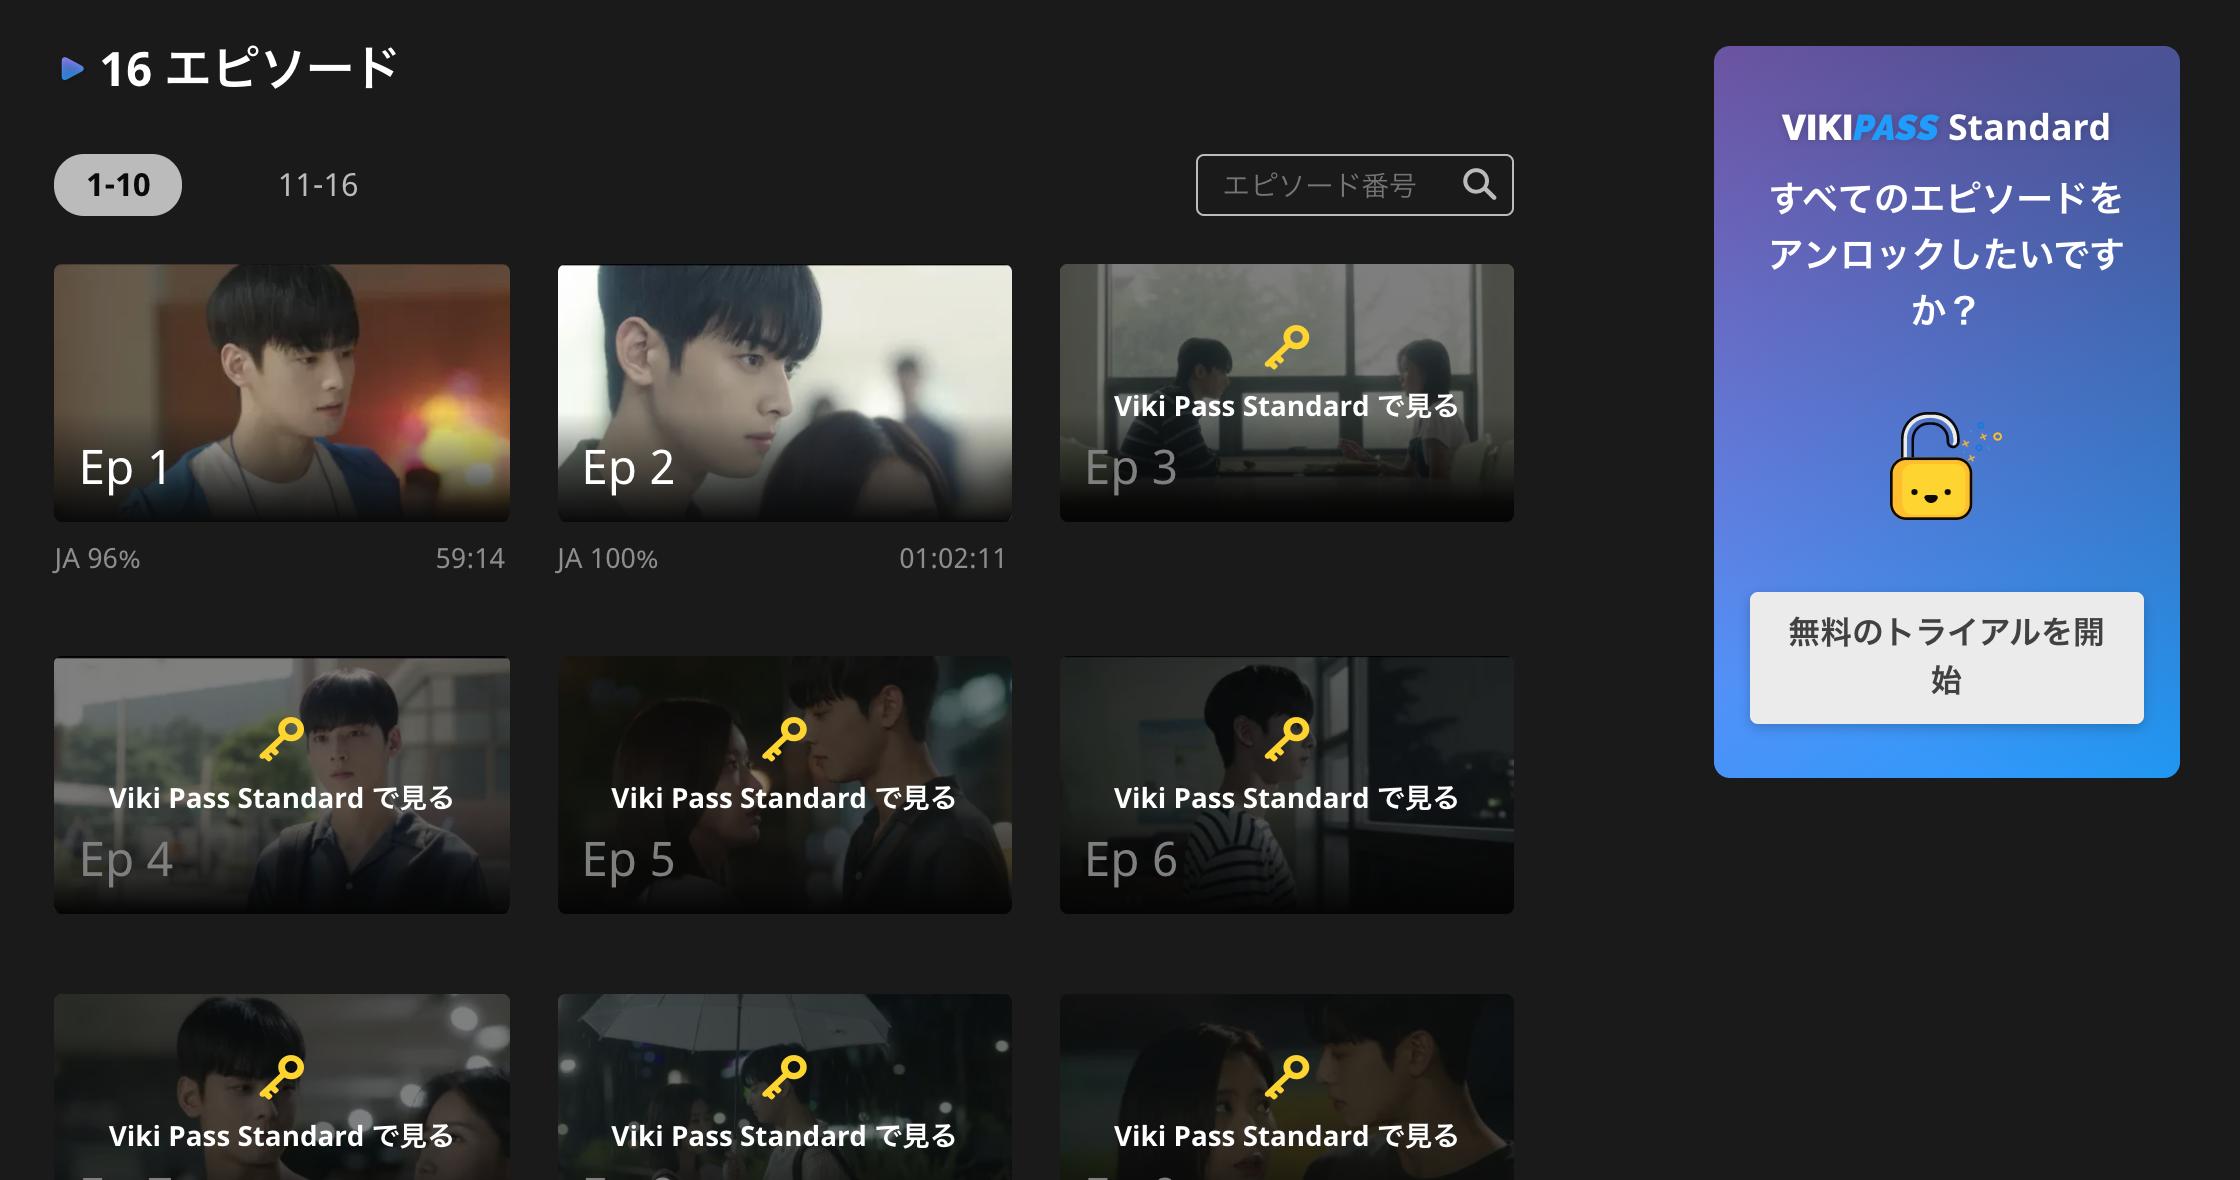 2話以降はviki pass standardで視聴可能!